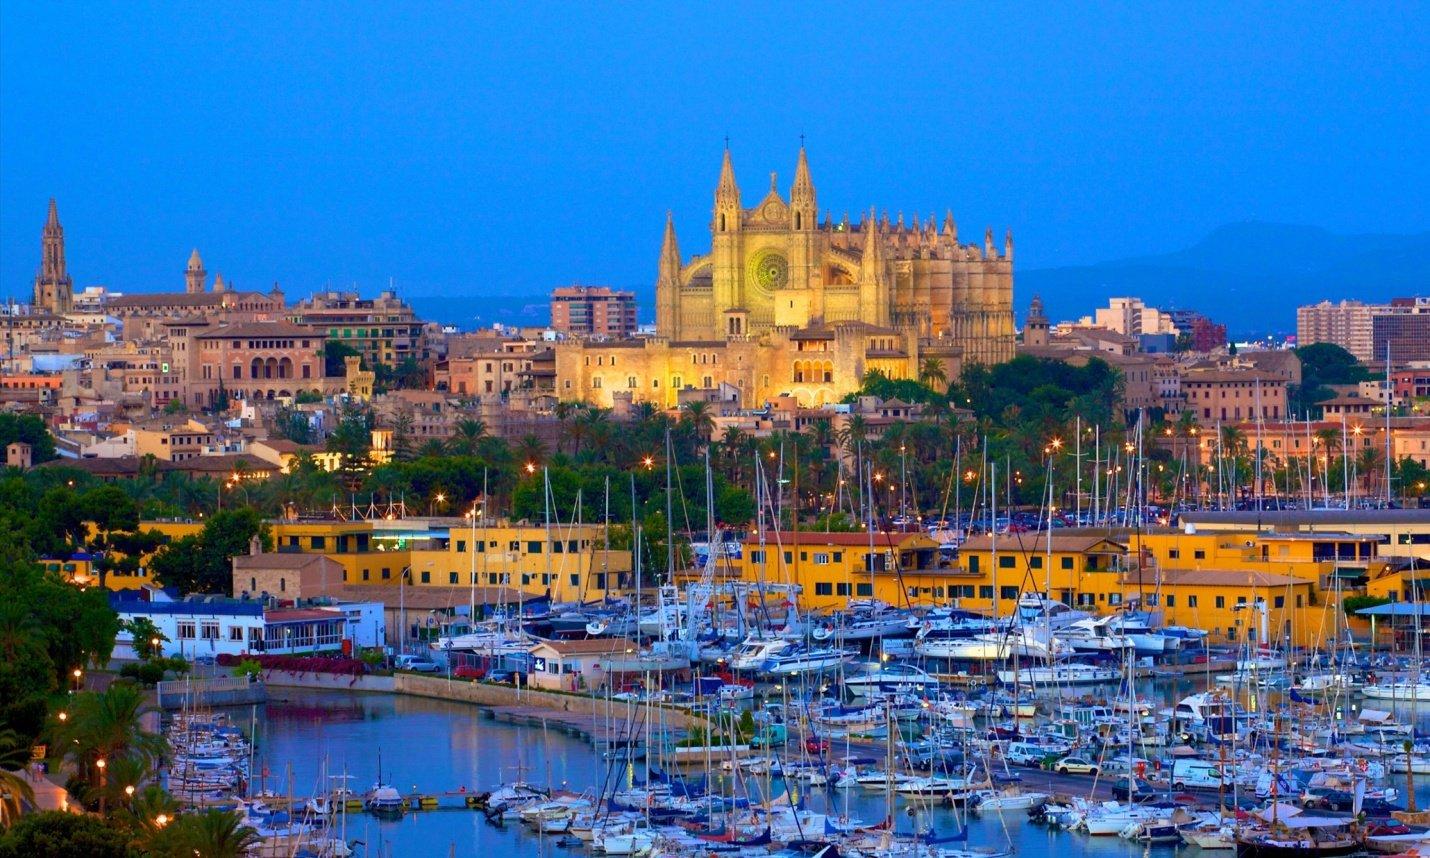 Брэд Питт купил виллу в Испании за 3,5 миллиона евро